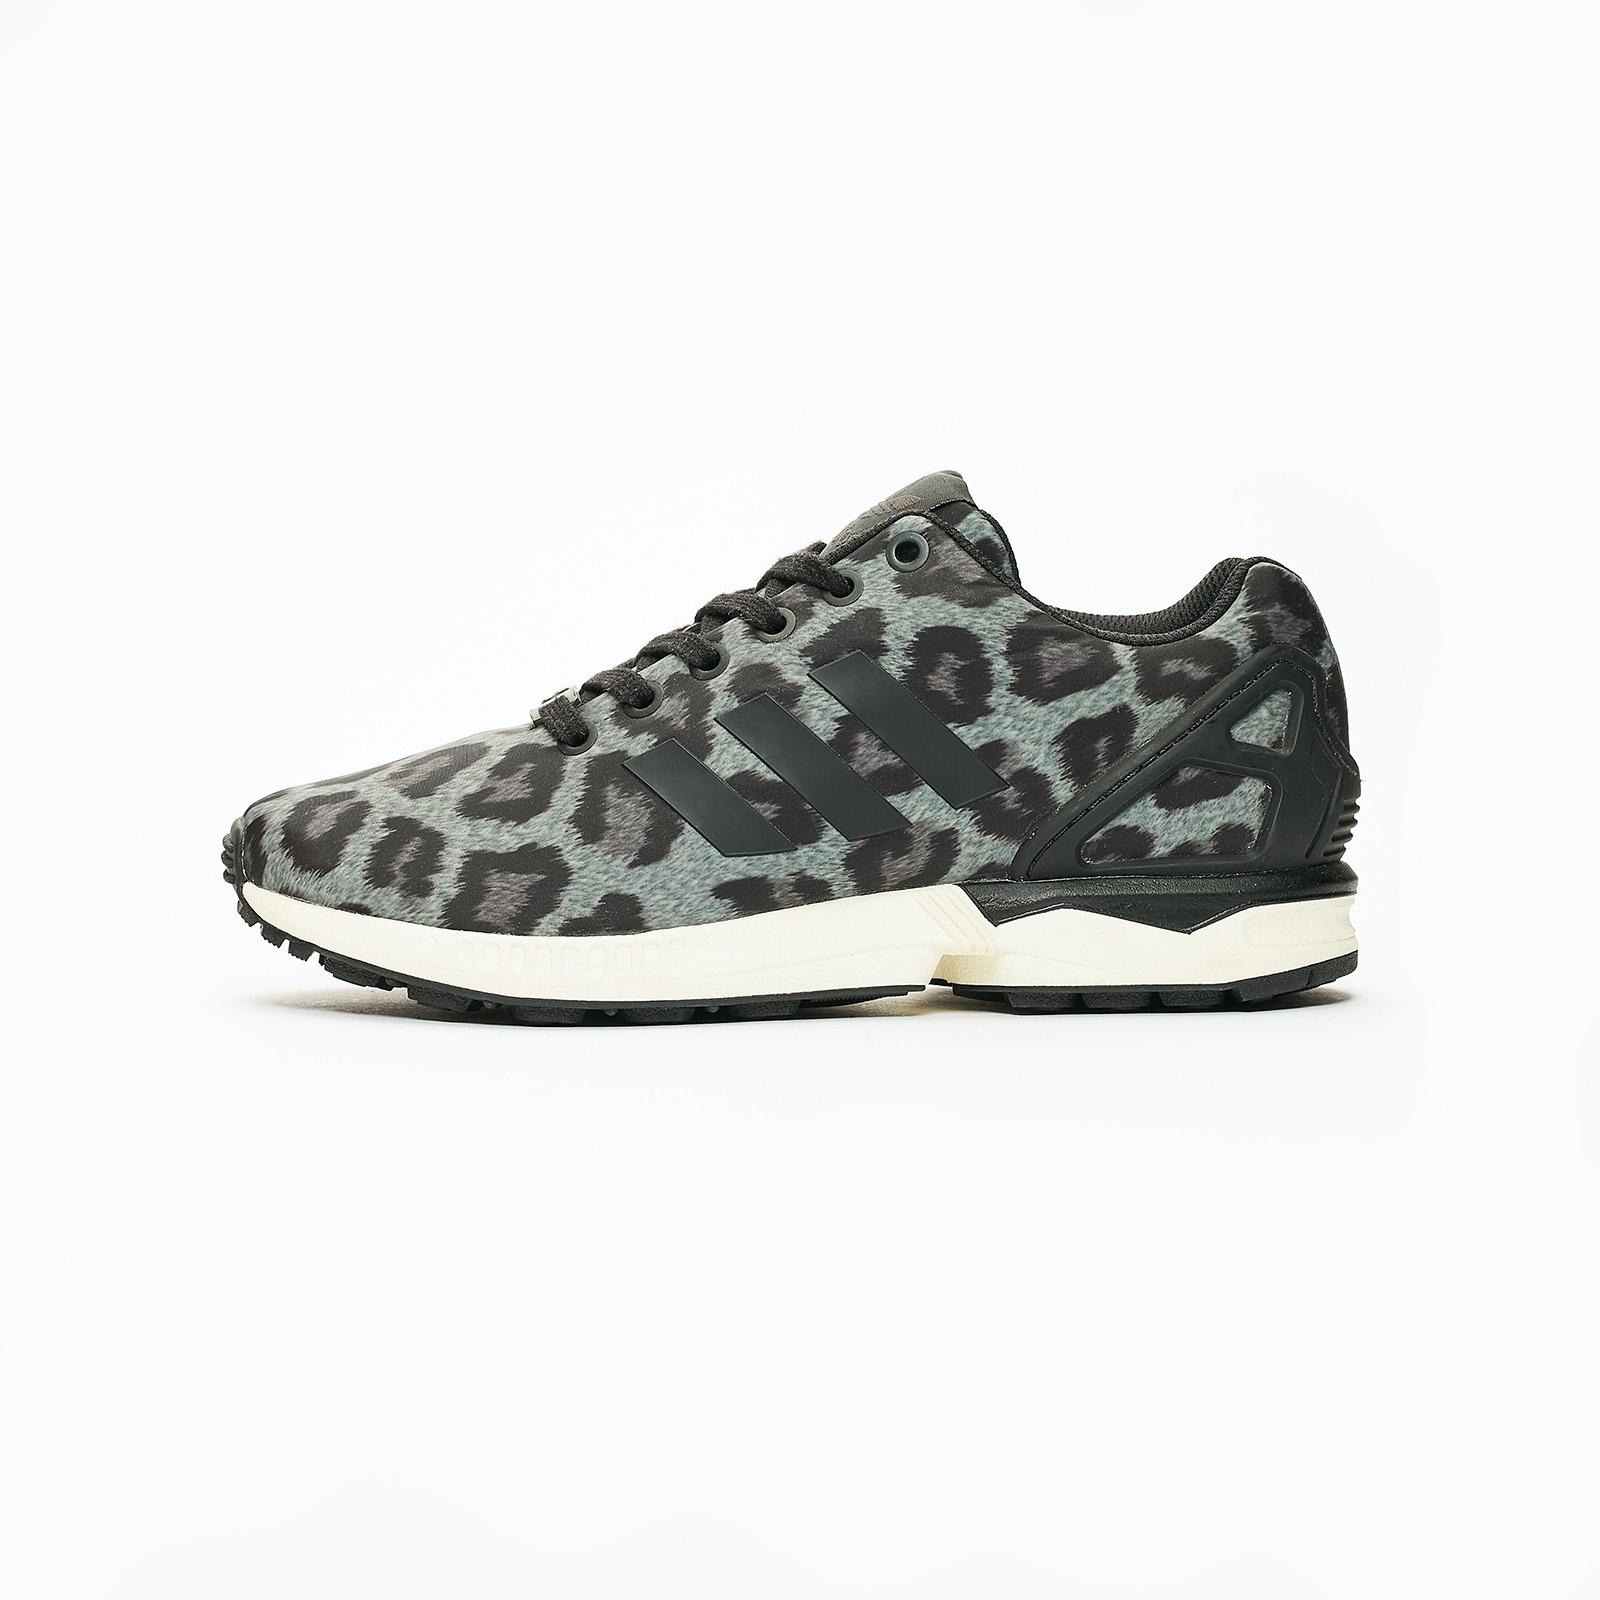 brand new 5e17b 41b0a adidas ZX Flux - Snow Leopard